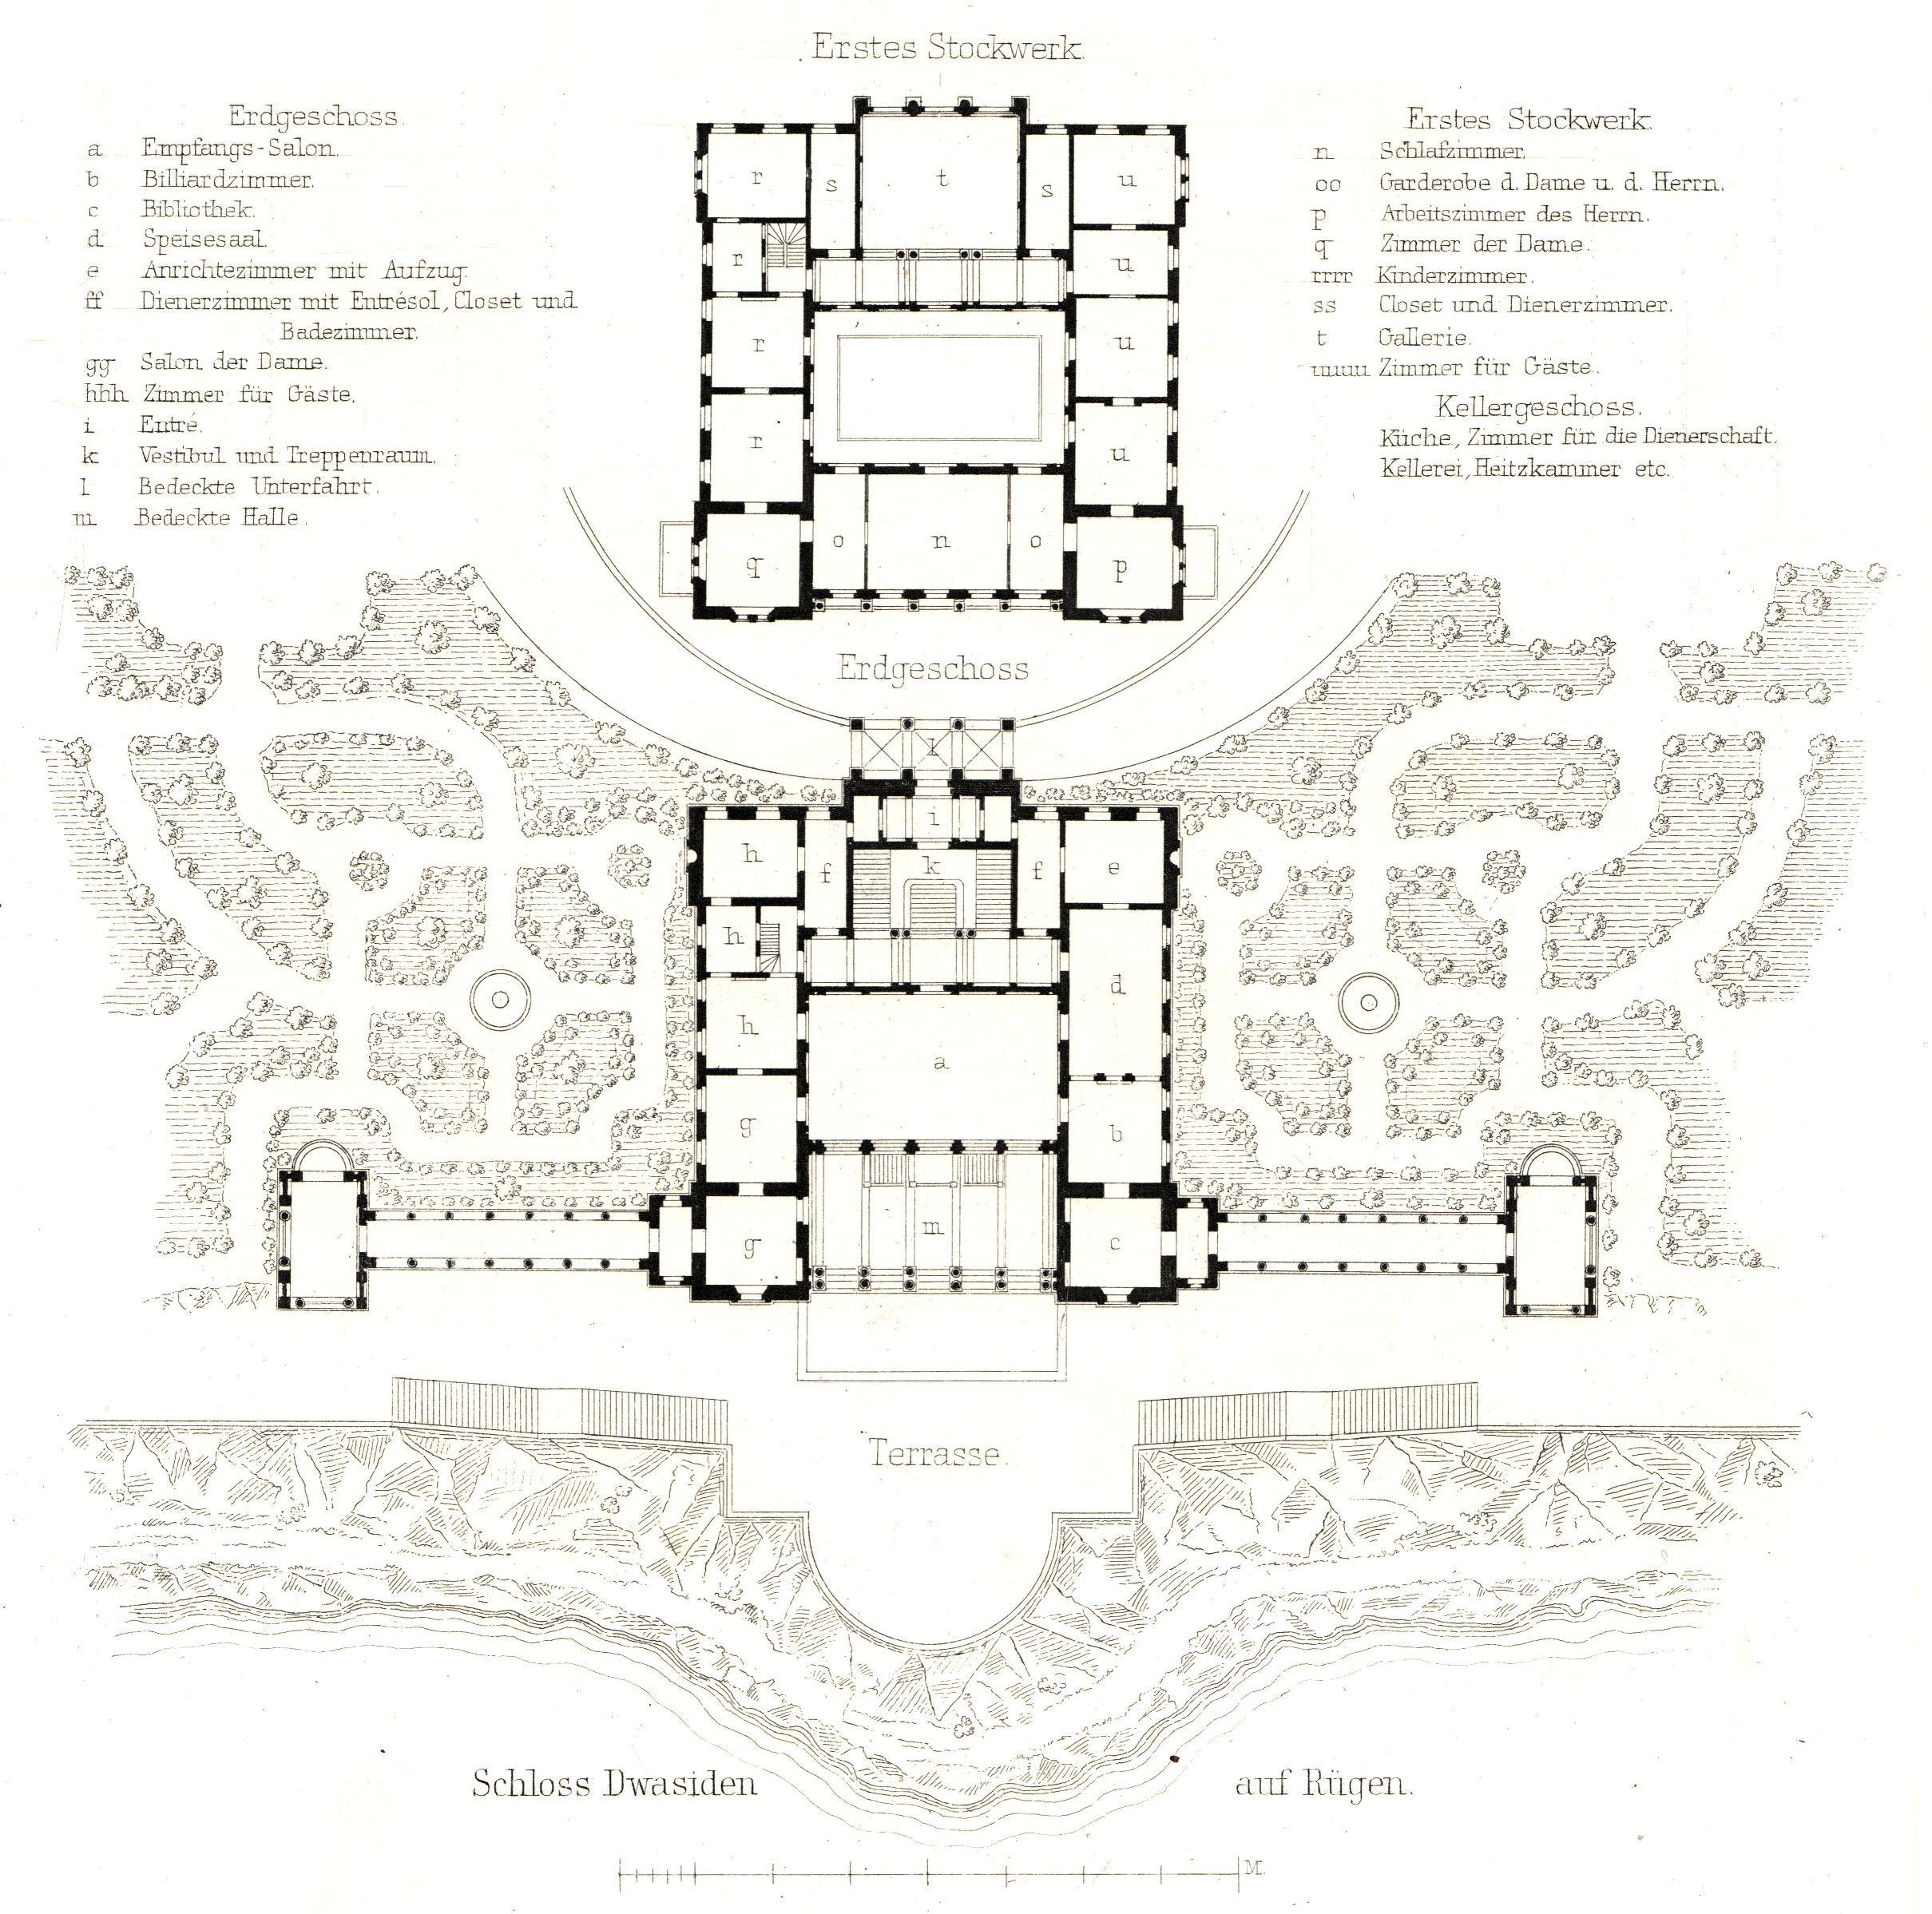 Schloss Dwasieden Grundriss As Jpg 2419 2397 Castle Floor Plan Architectural Floor Plans Castle Plans